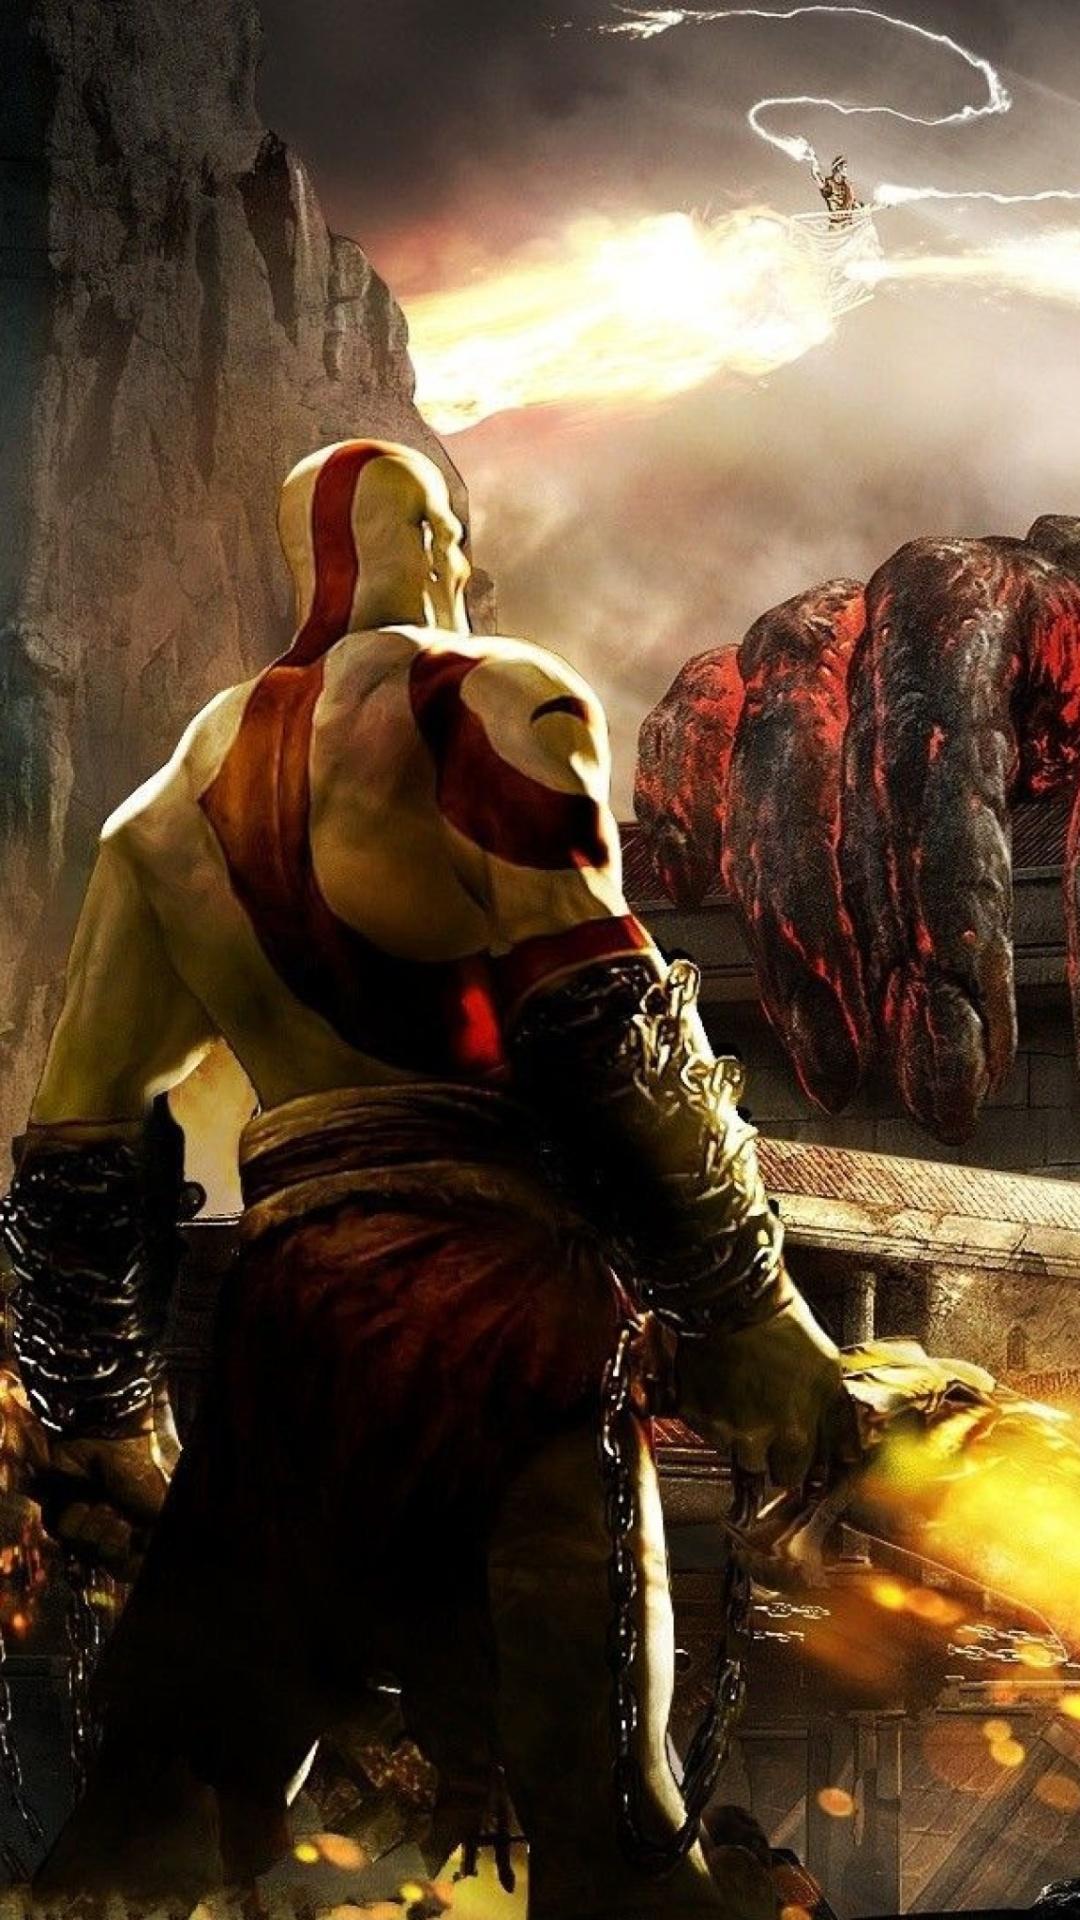 Video Games God Of War 4 Missions Playstation 3 God Of War Hd